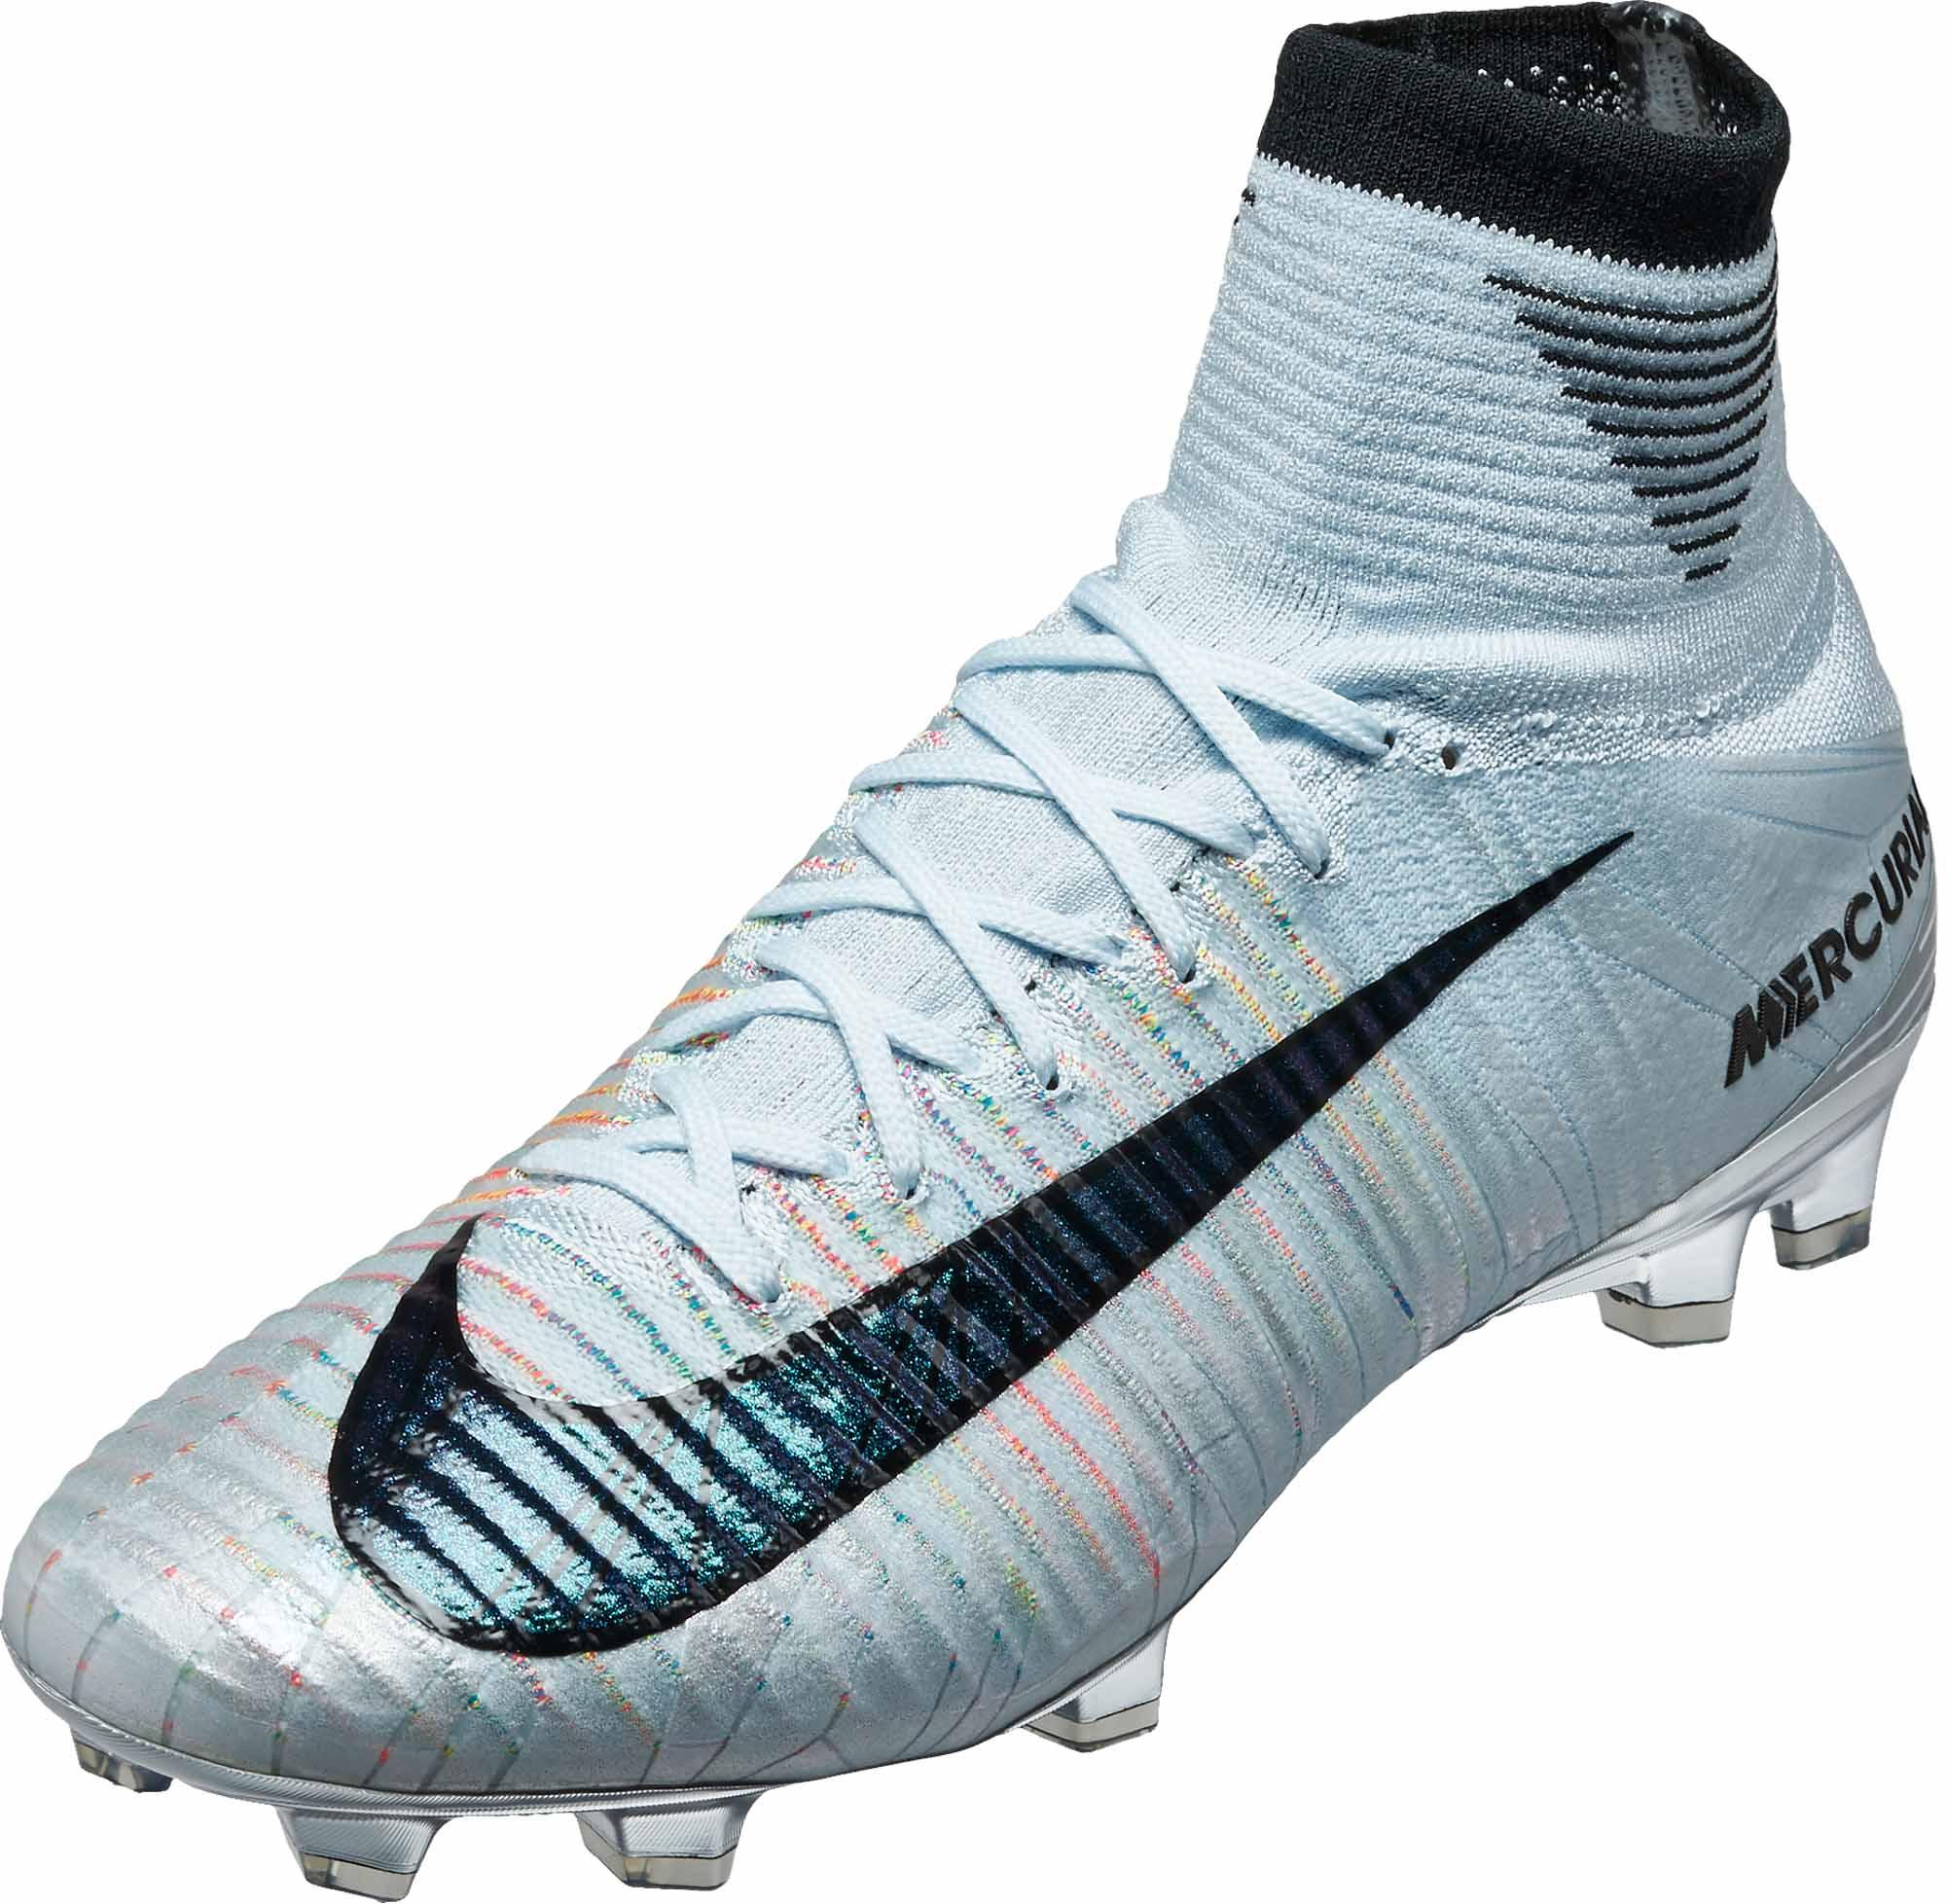 Nike Mercurial SuperFly IV CR7 FG Soccer Cleats Pinterest